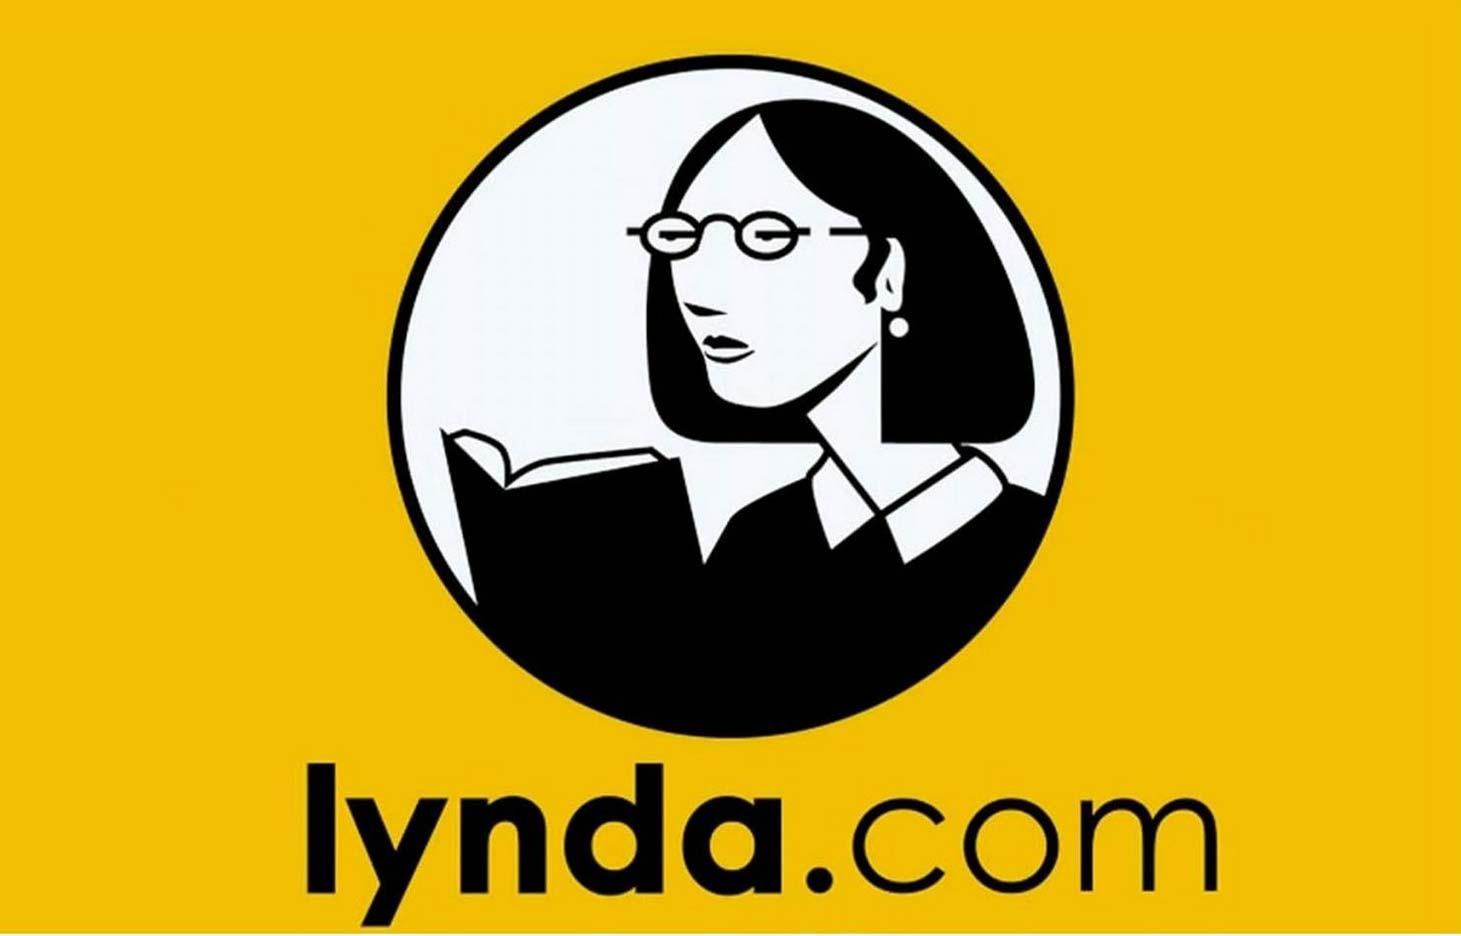 Lynda Com - Udemy Competitors